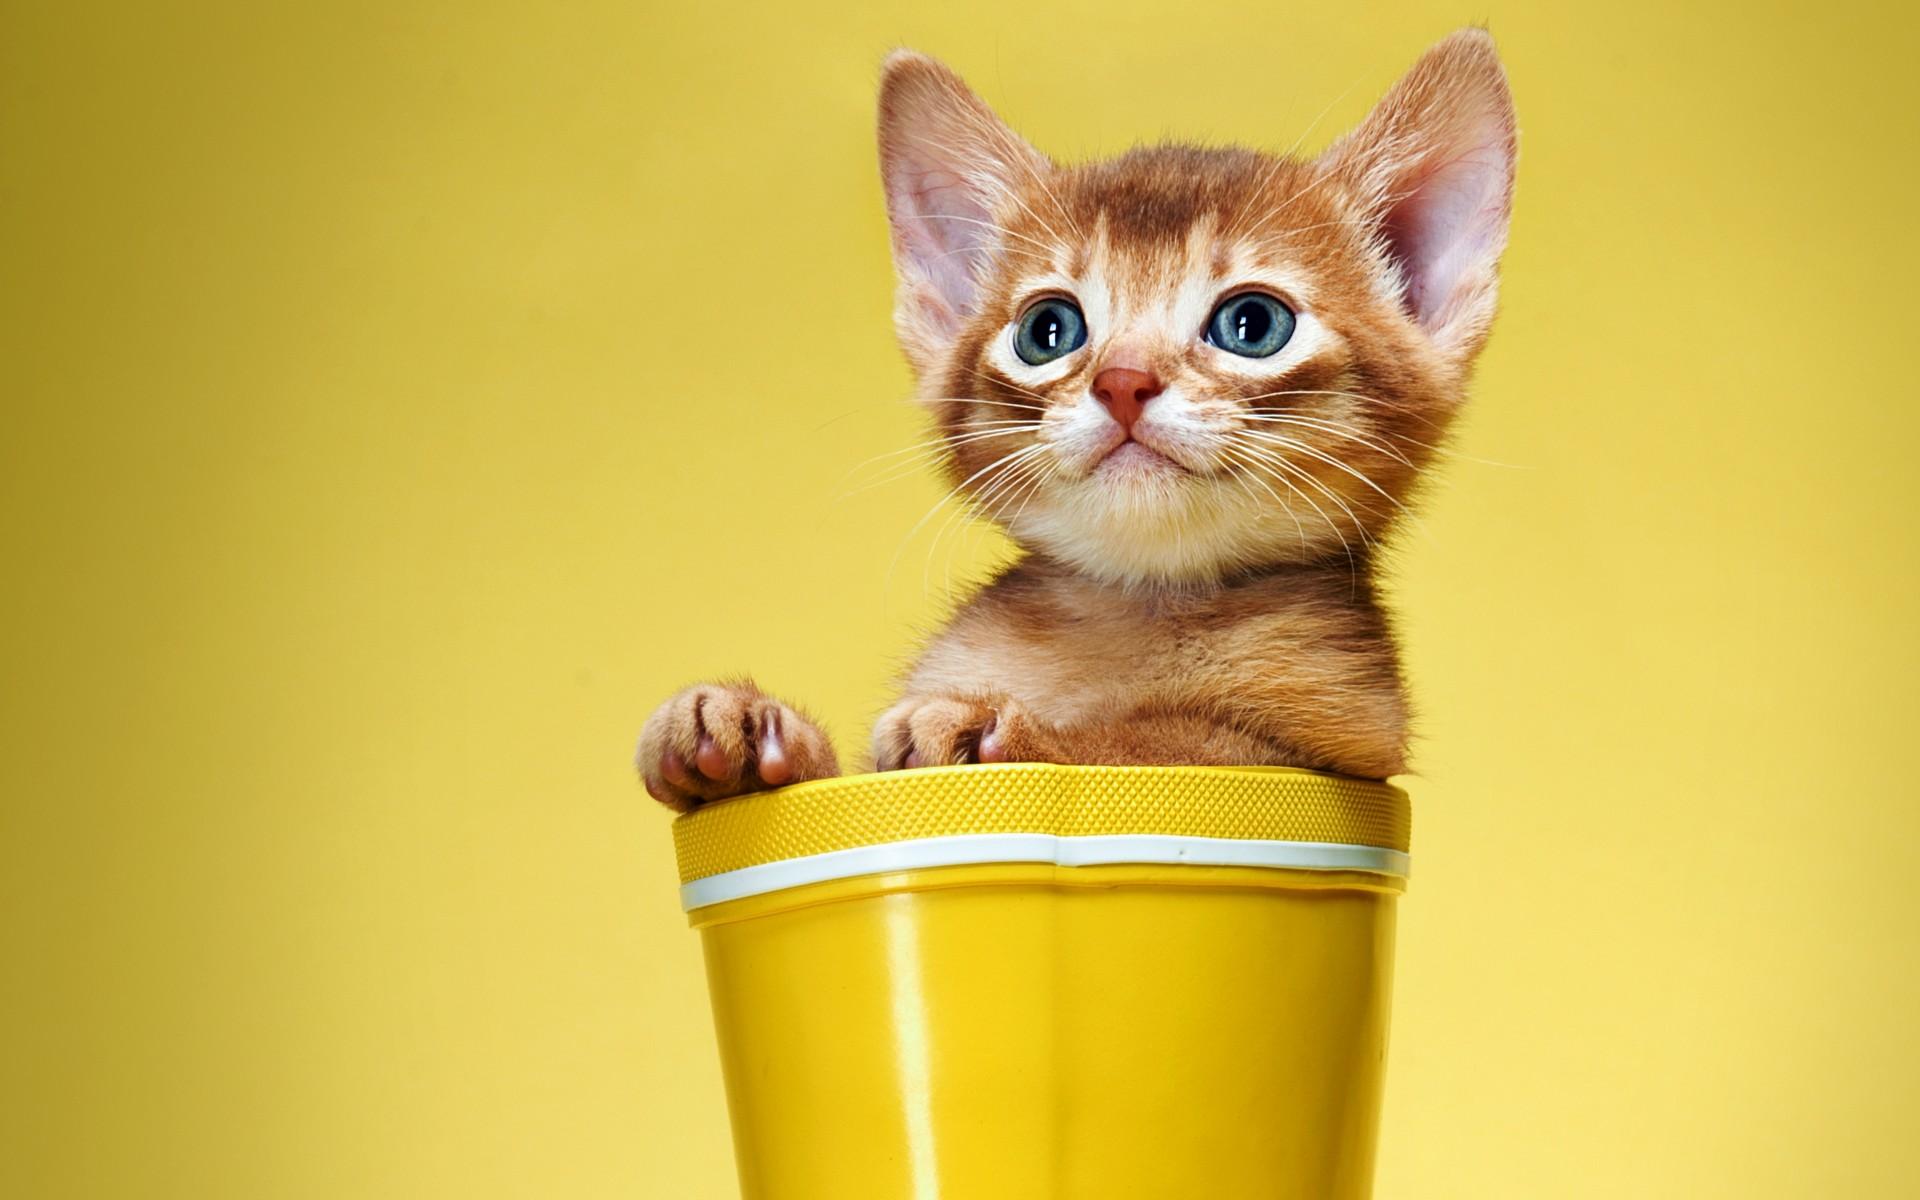 Cool Cat Wallpaper 1920x1200 - 3f08c8305ab0c161be16b418de69eb40  Trends_895677 .jpg